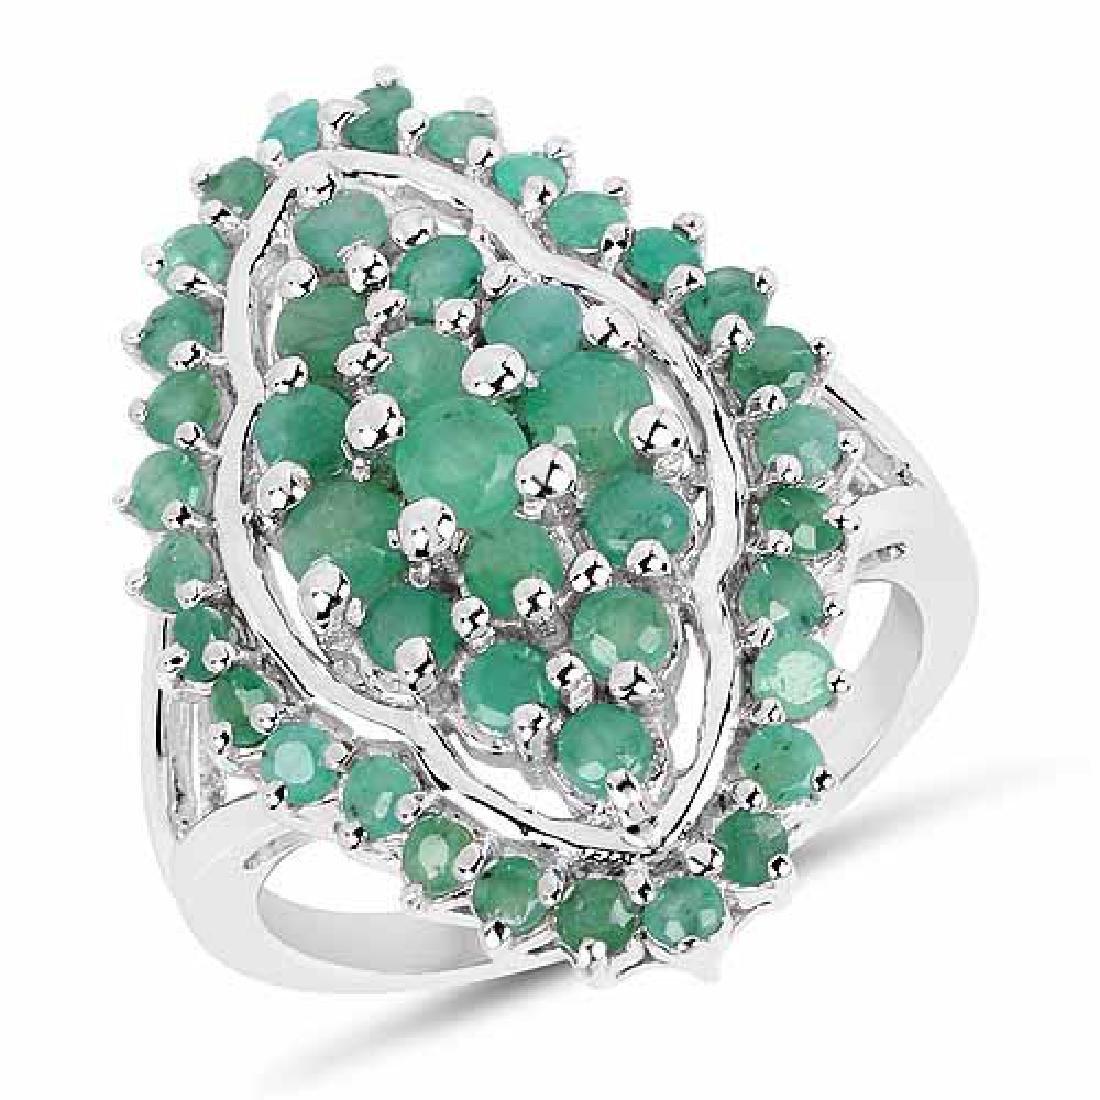 1.74 Carat Genuine Emerald .925 Sterling Silver Ring